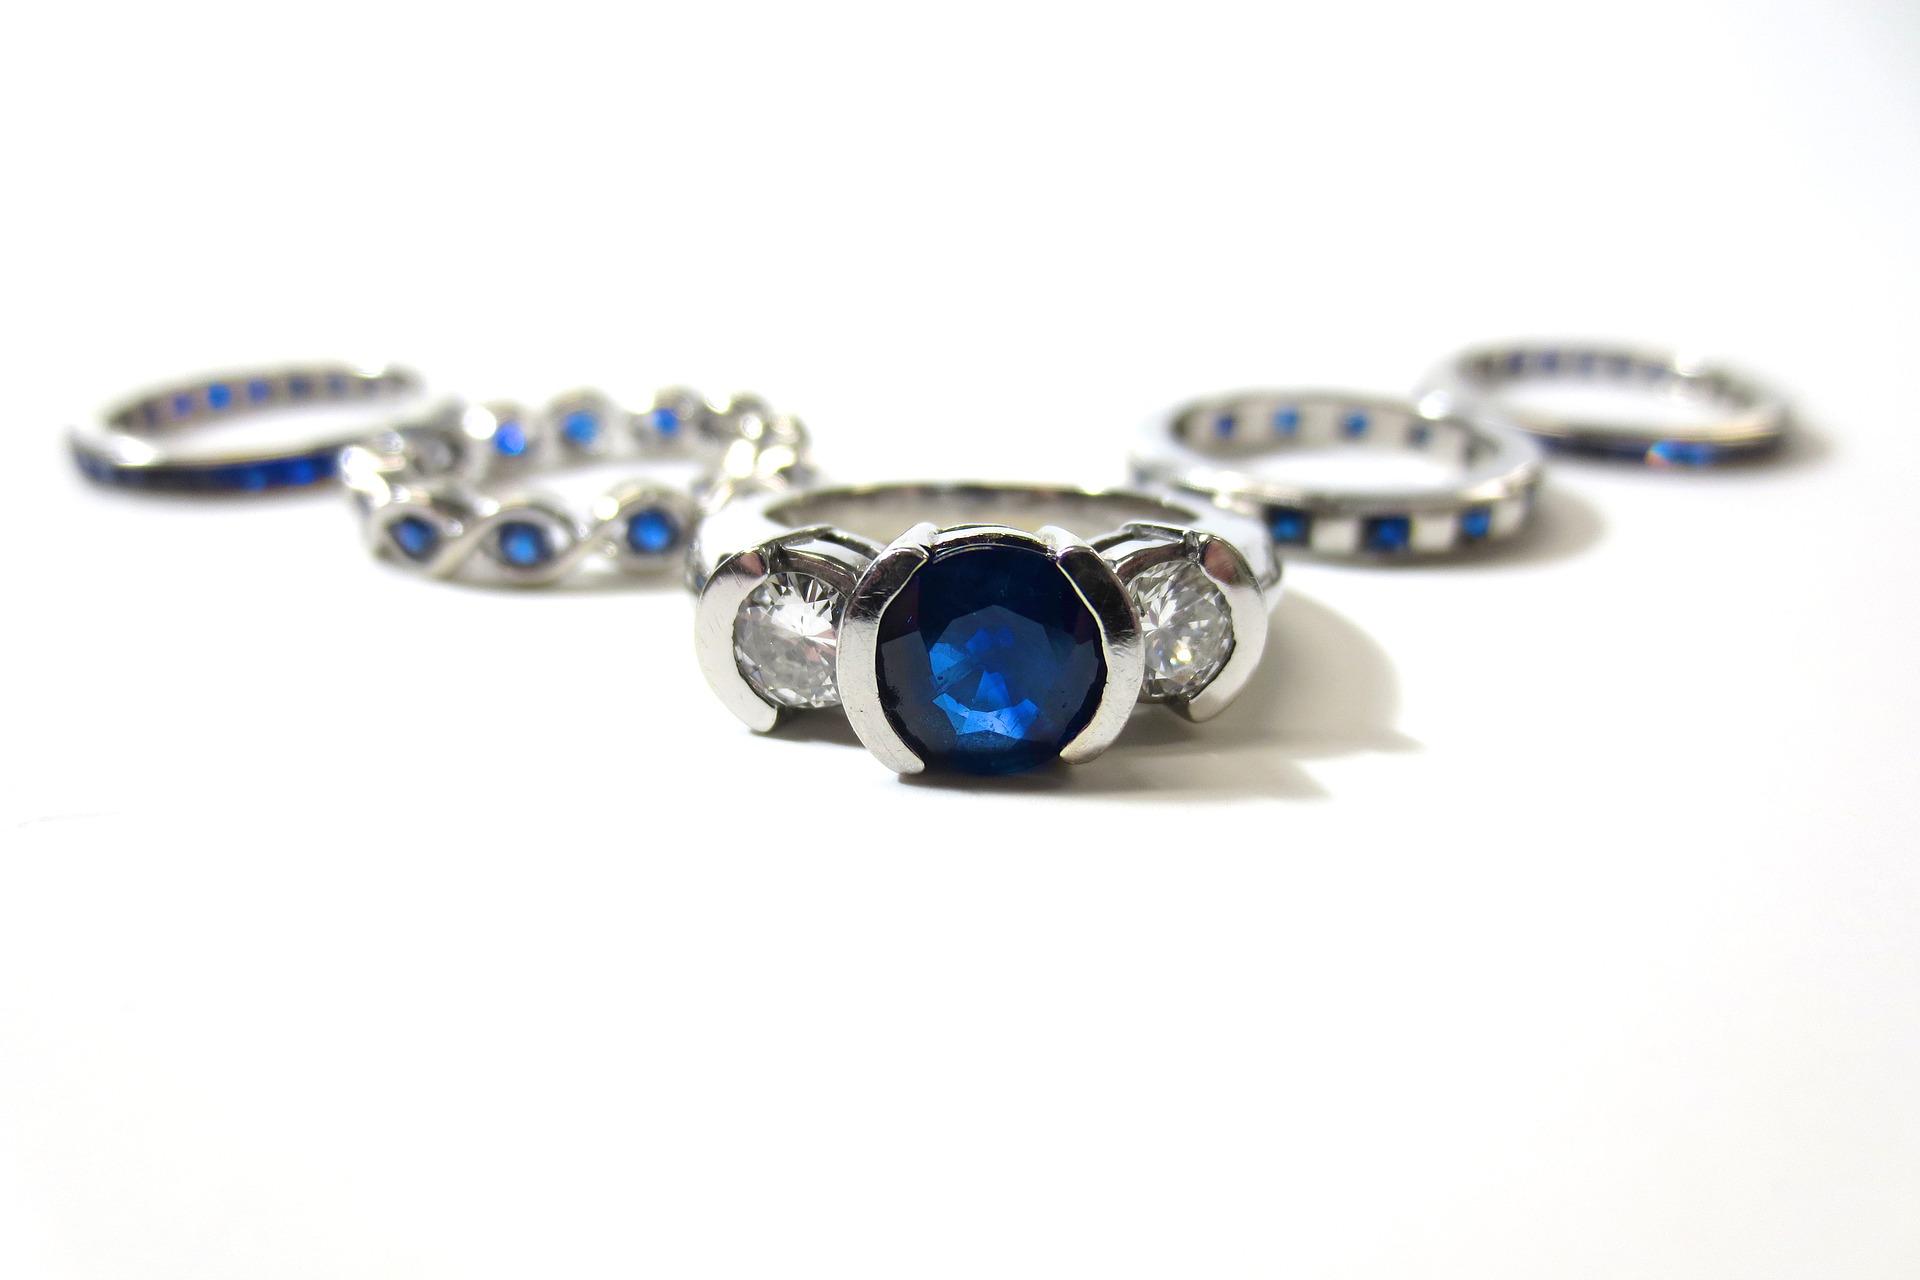 jewelry-3132920_1920